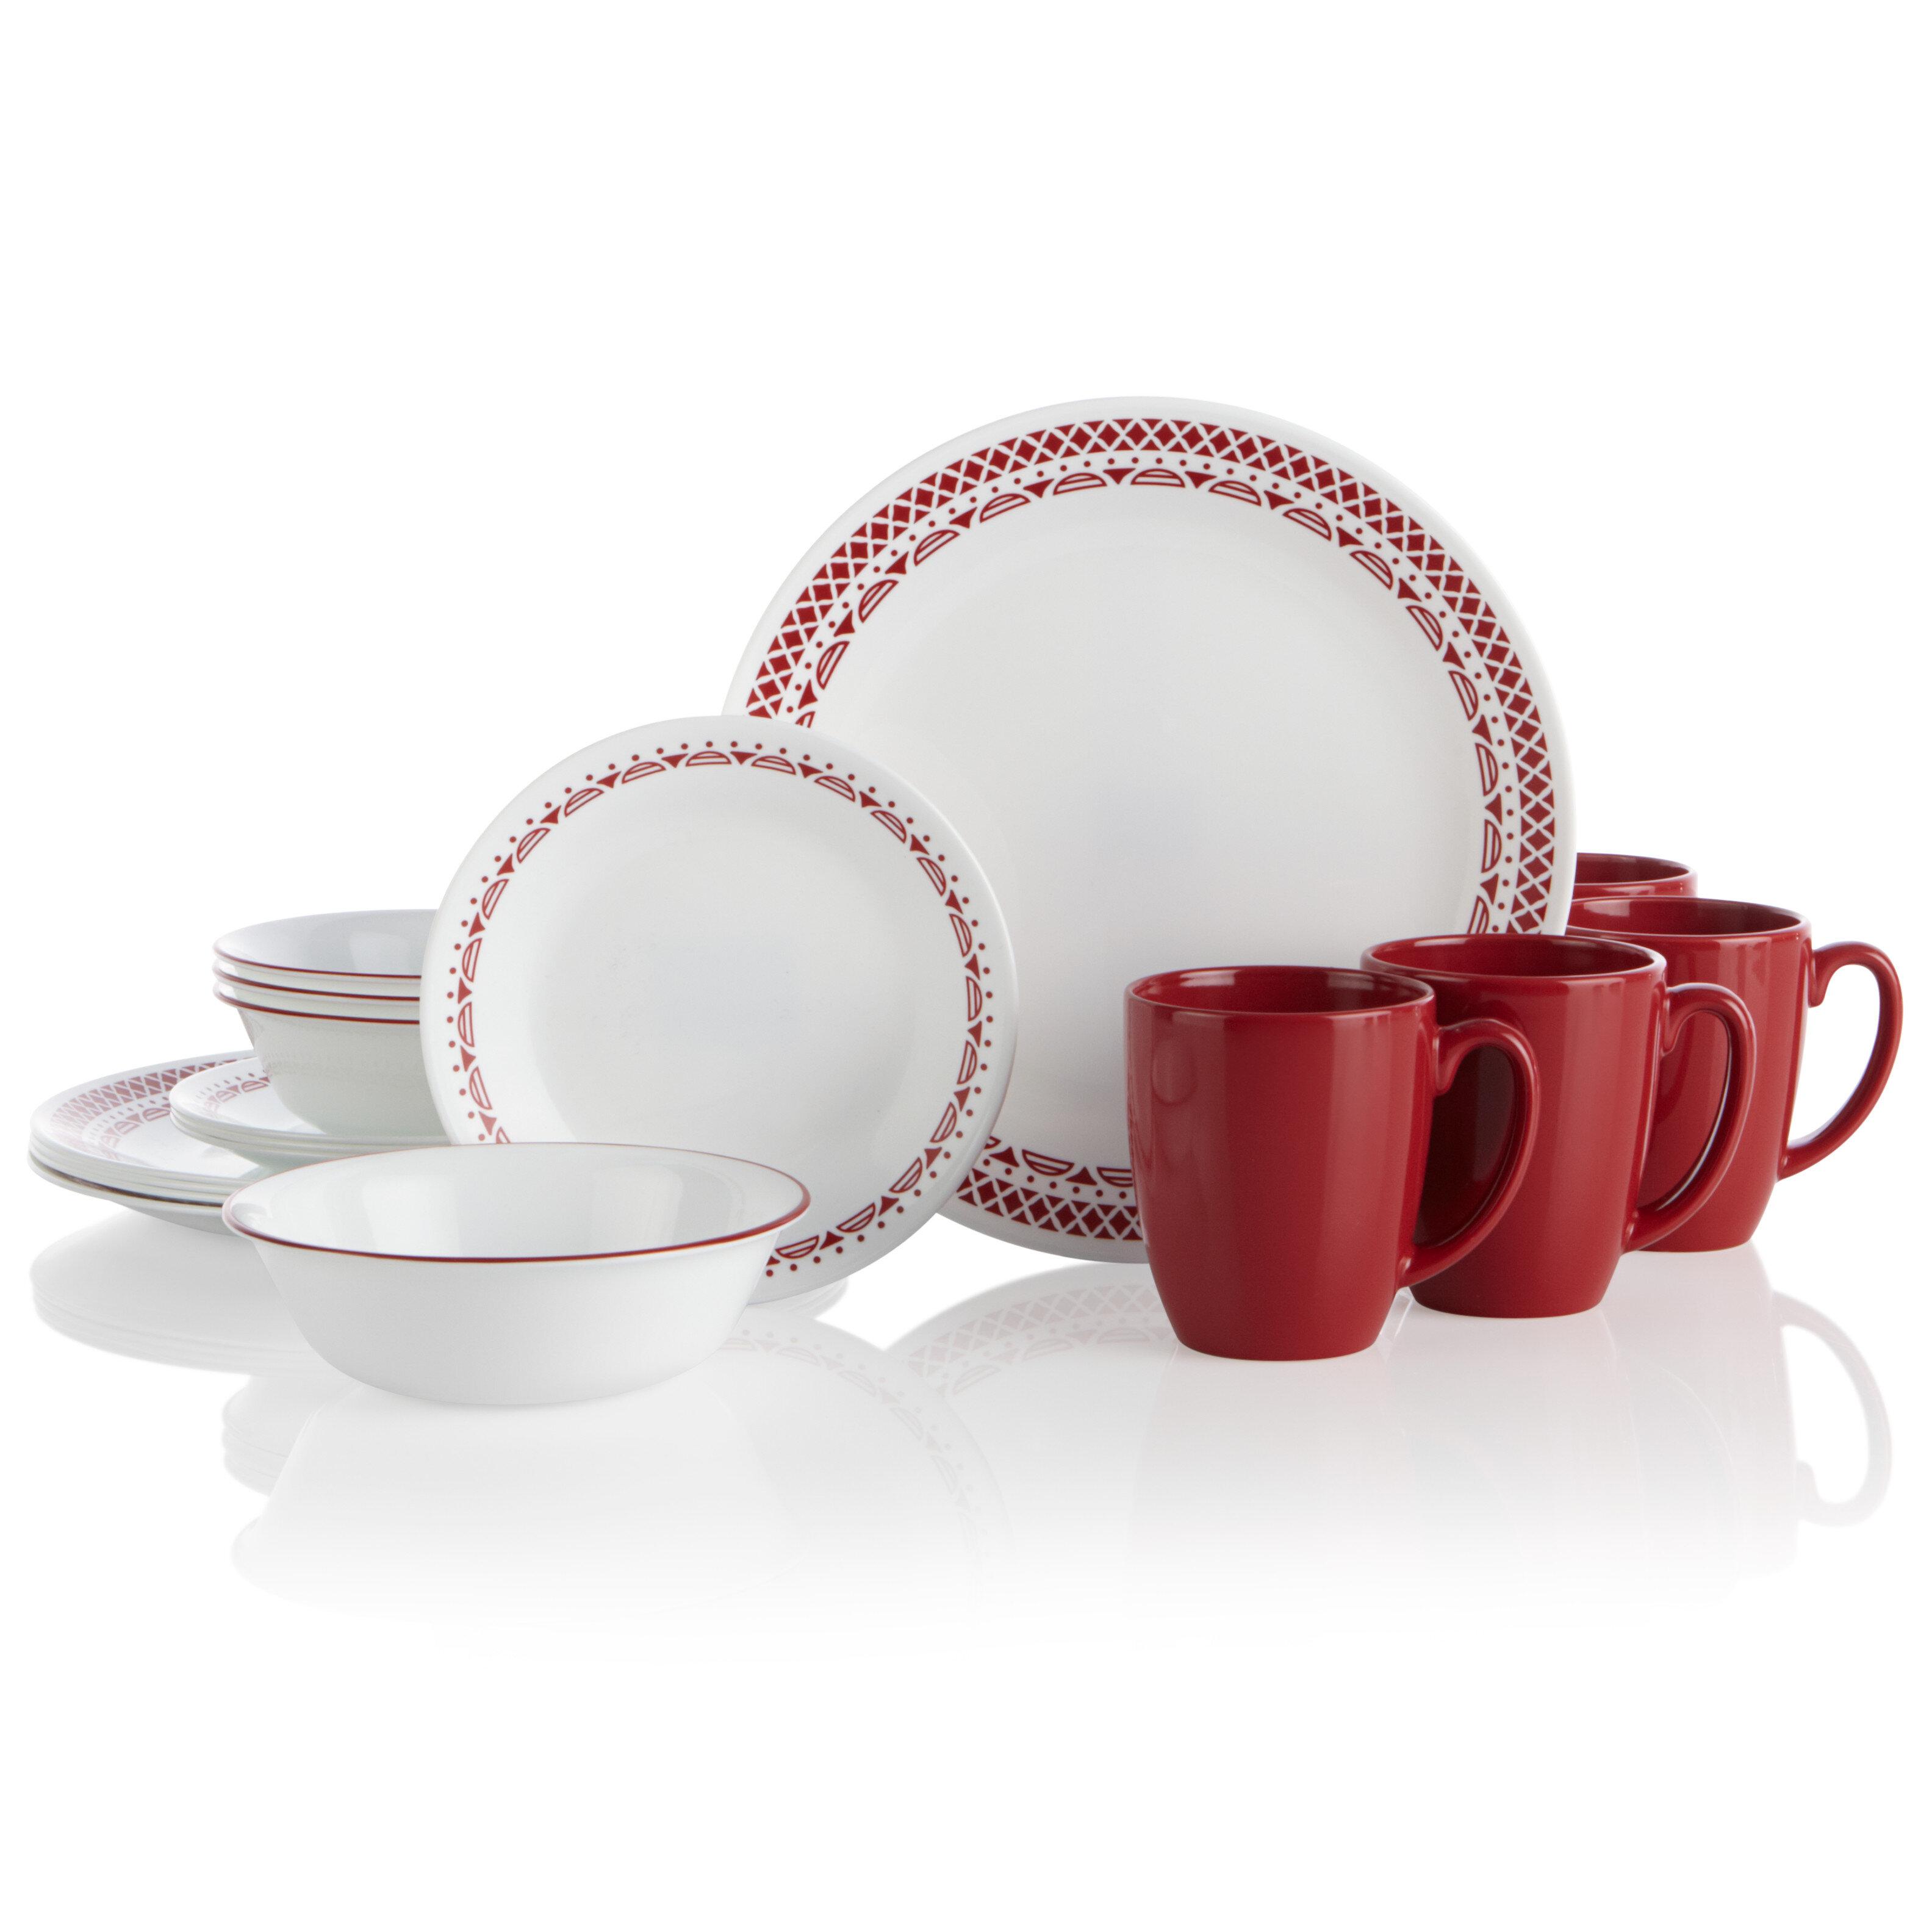 Microwave Safe Corelle Dinnerware Sets Up To 65 Off Until 11 20 Wayfair Wayfair